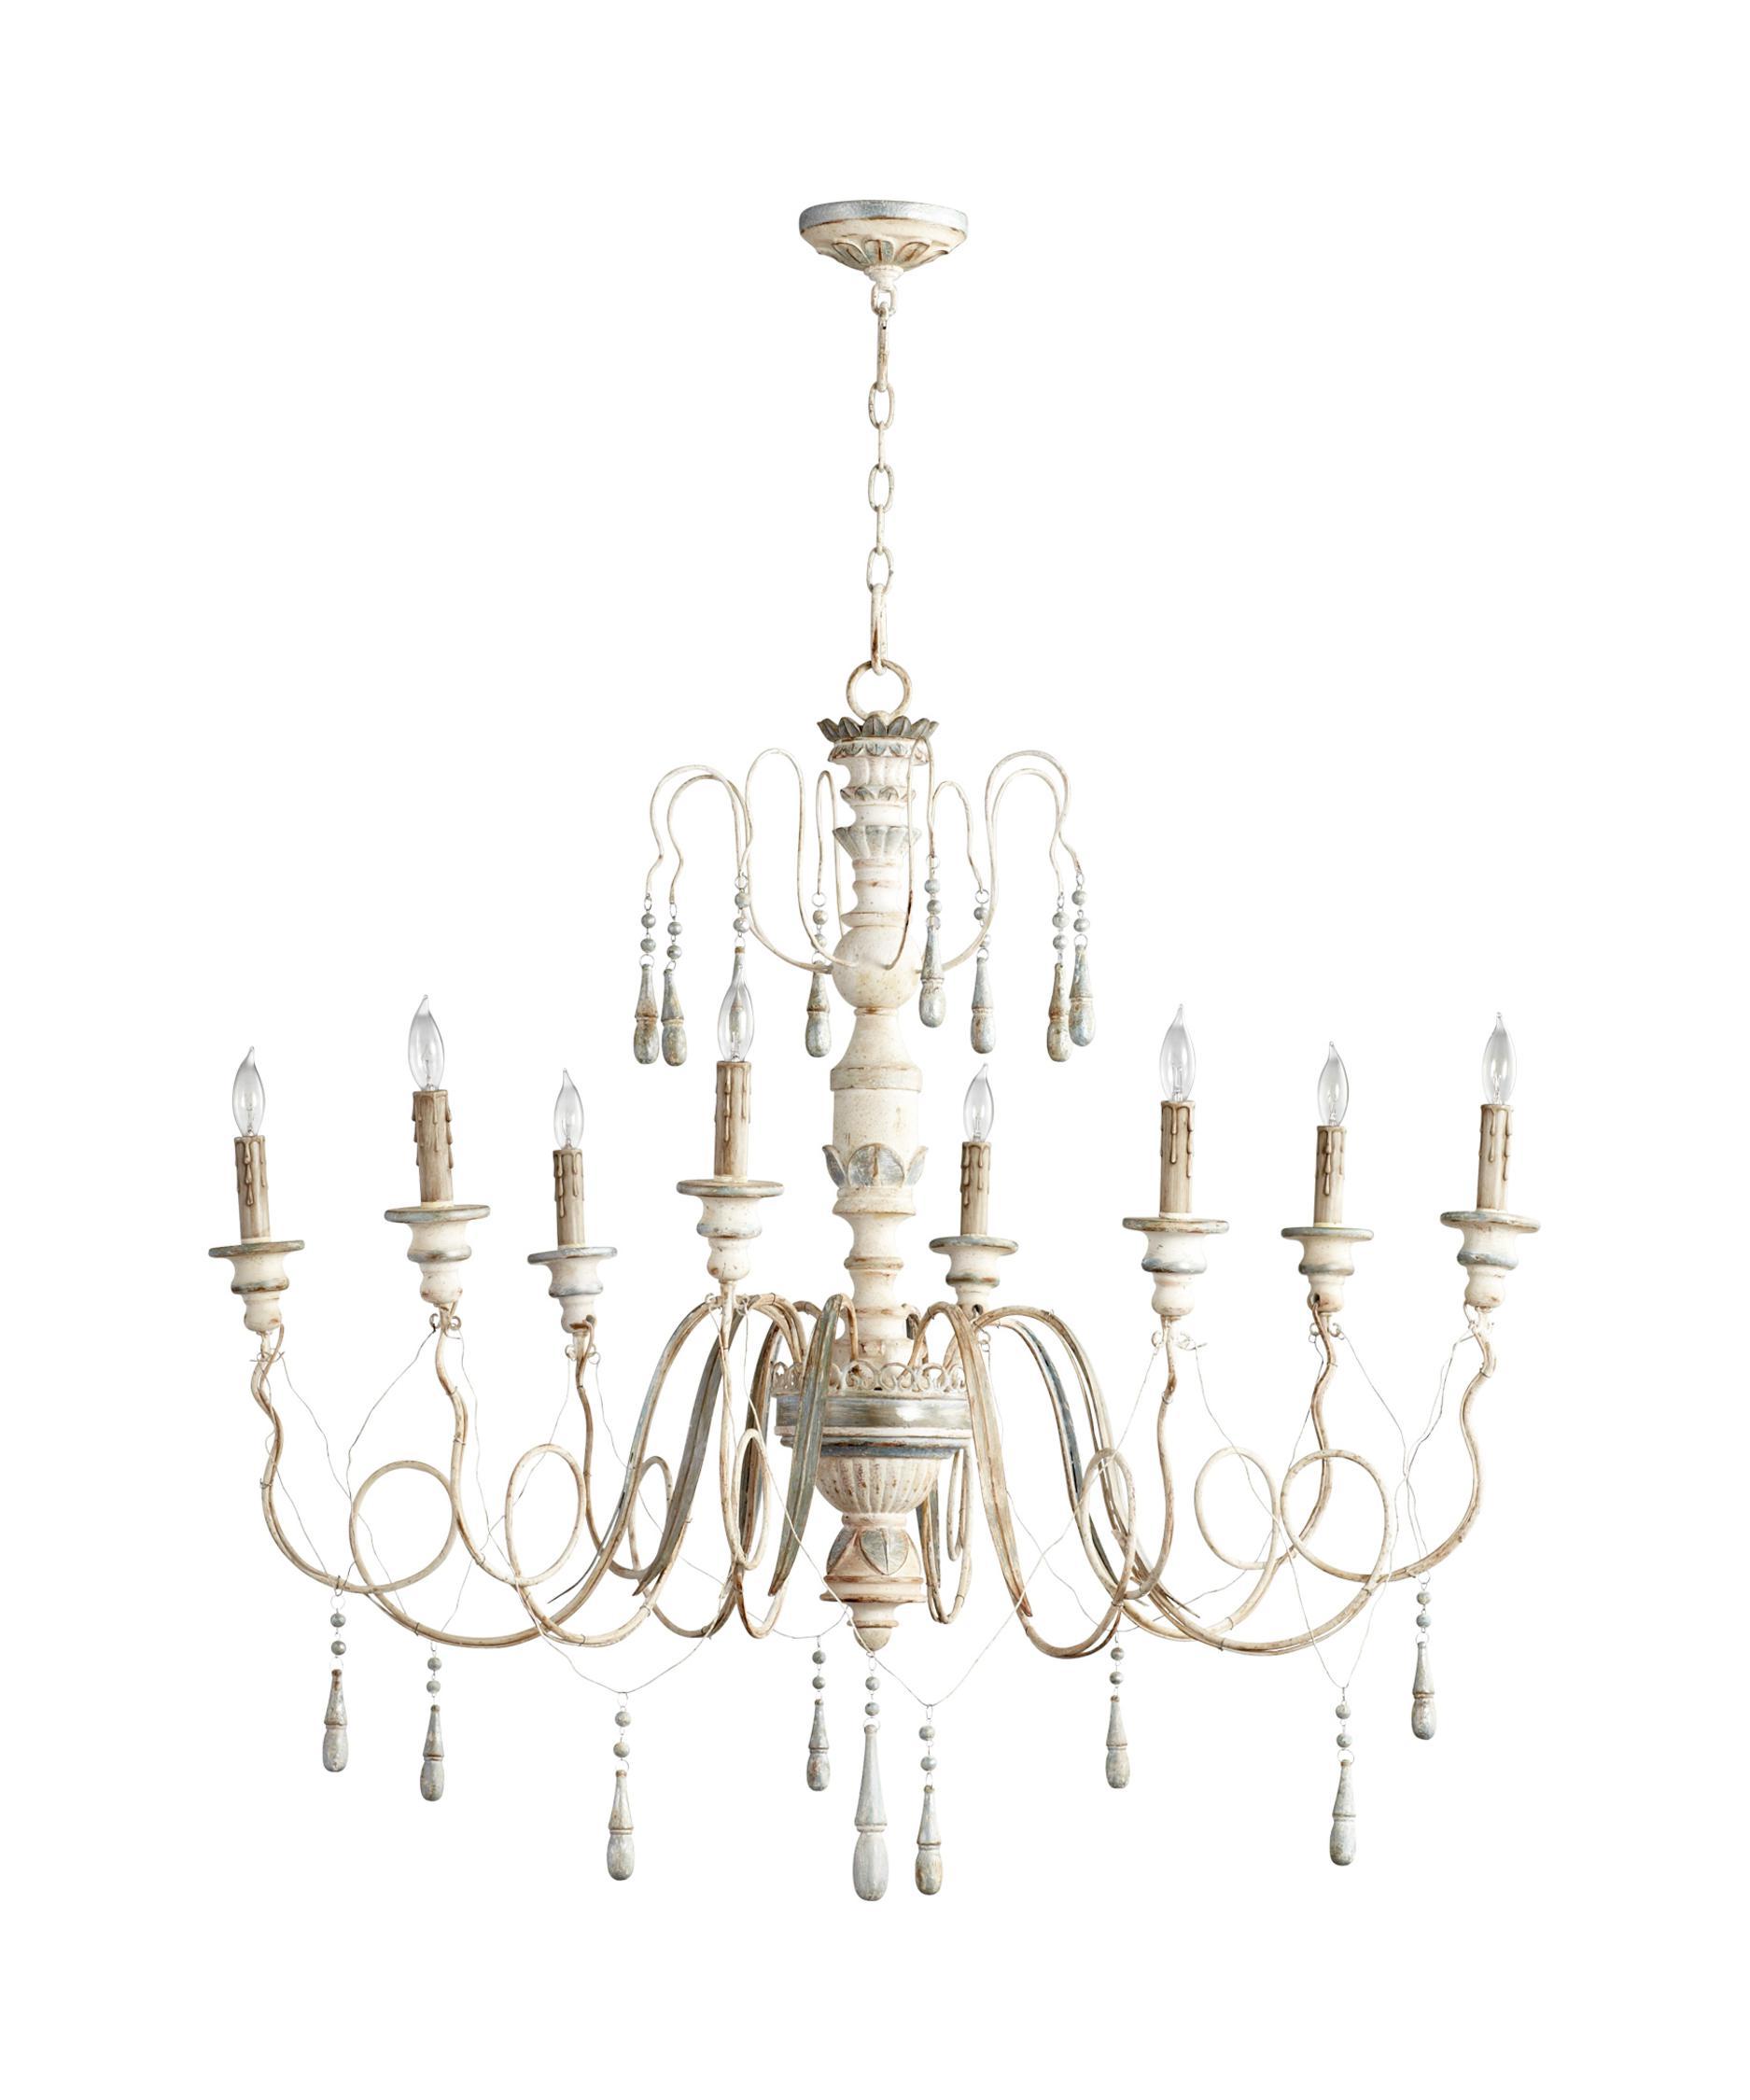 cyan design 05714 chantal chandelier | capitol lighting 1